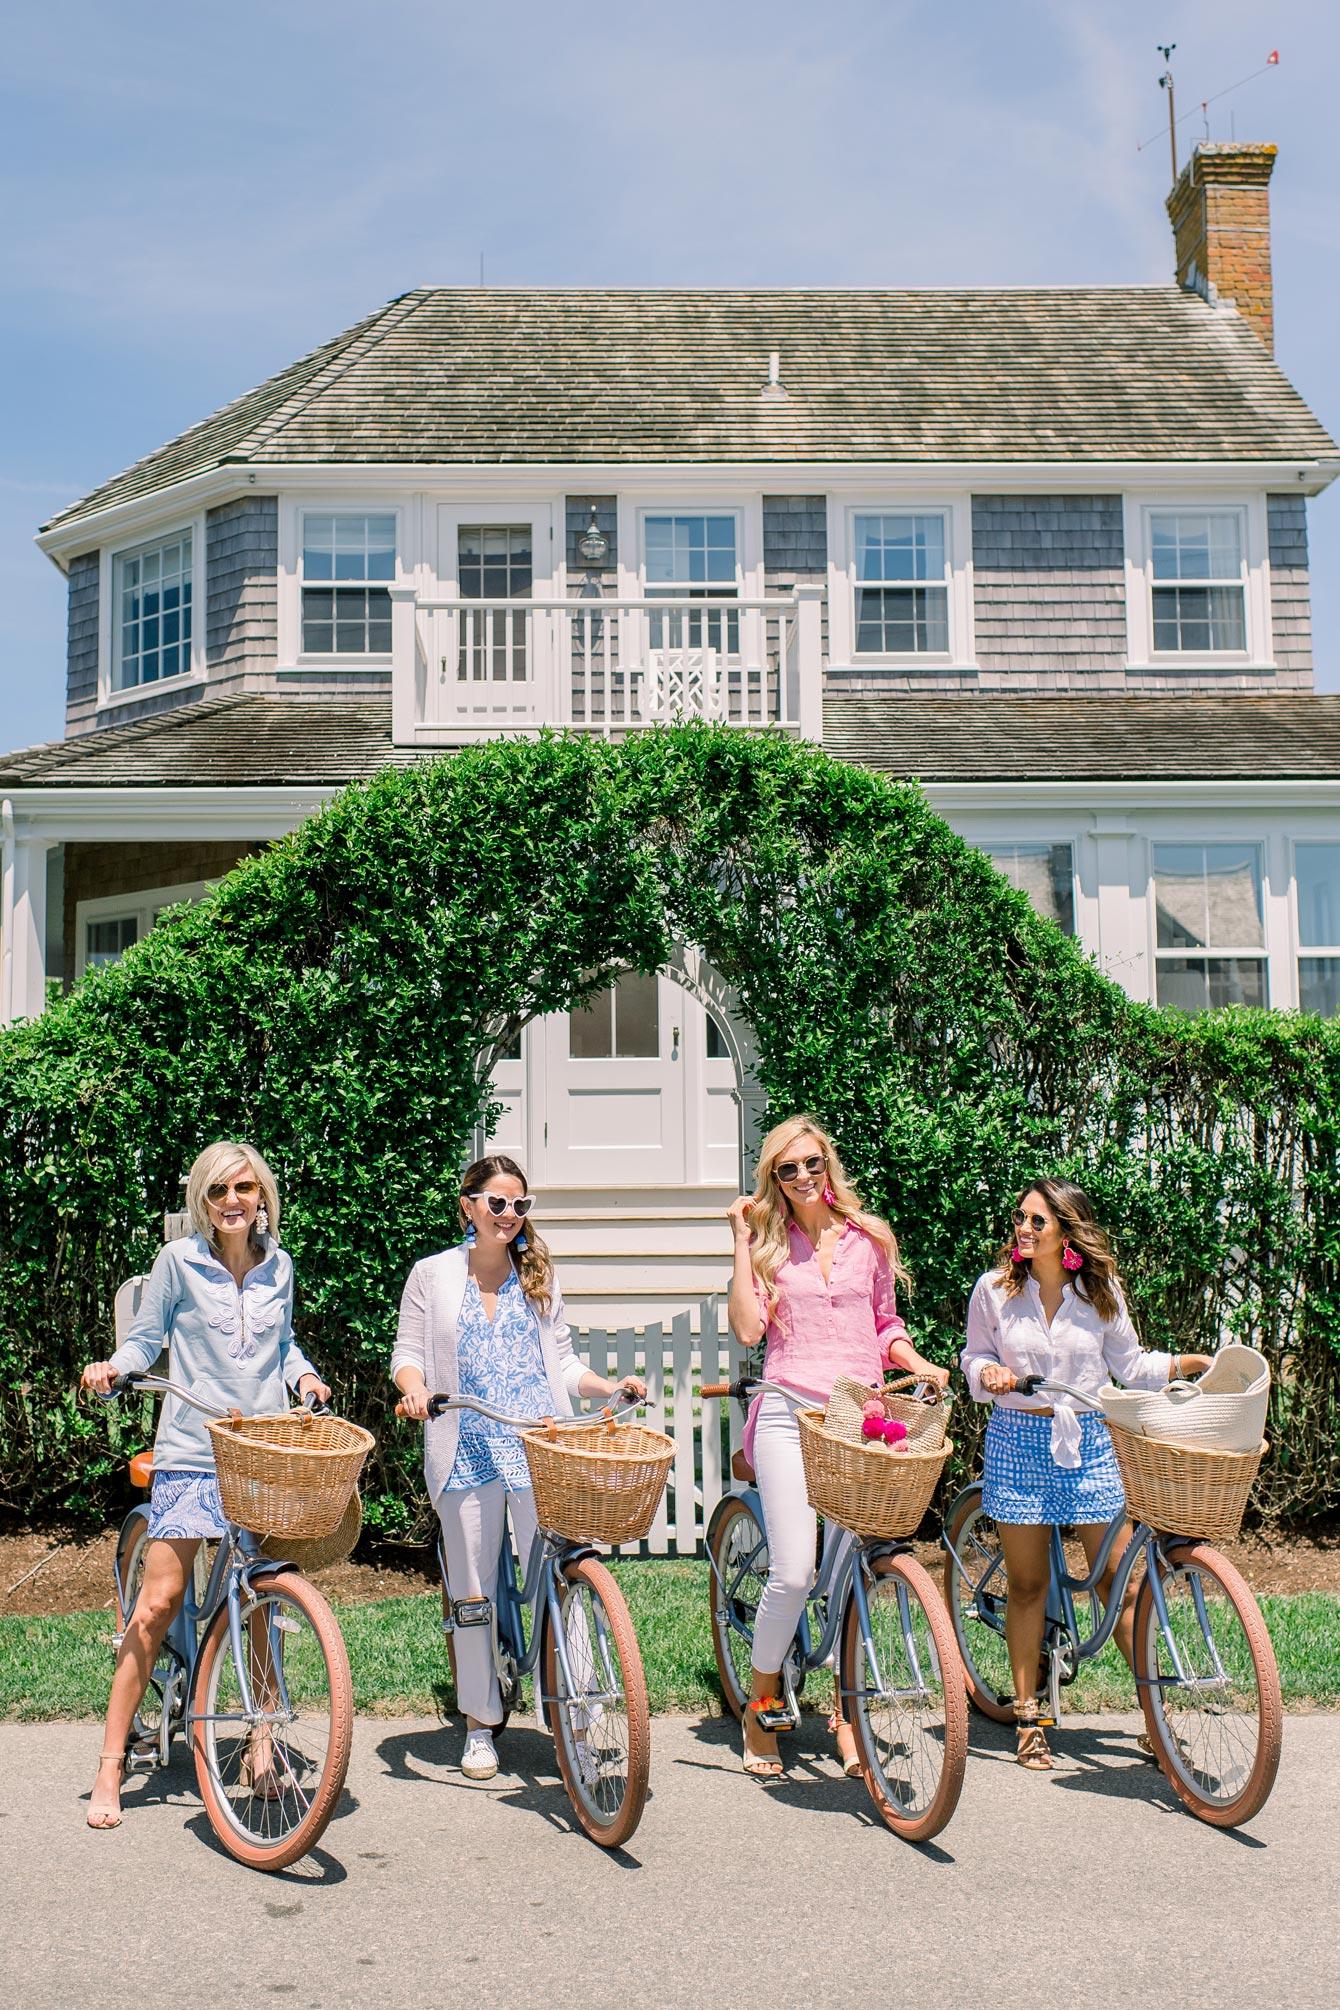 White Elephant Nantucket Bicycles